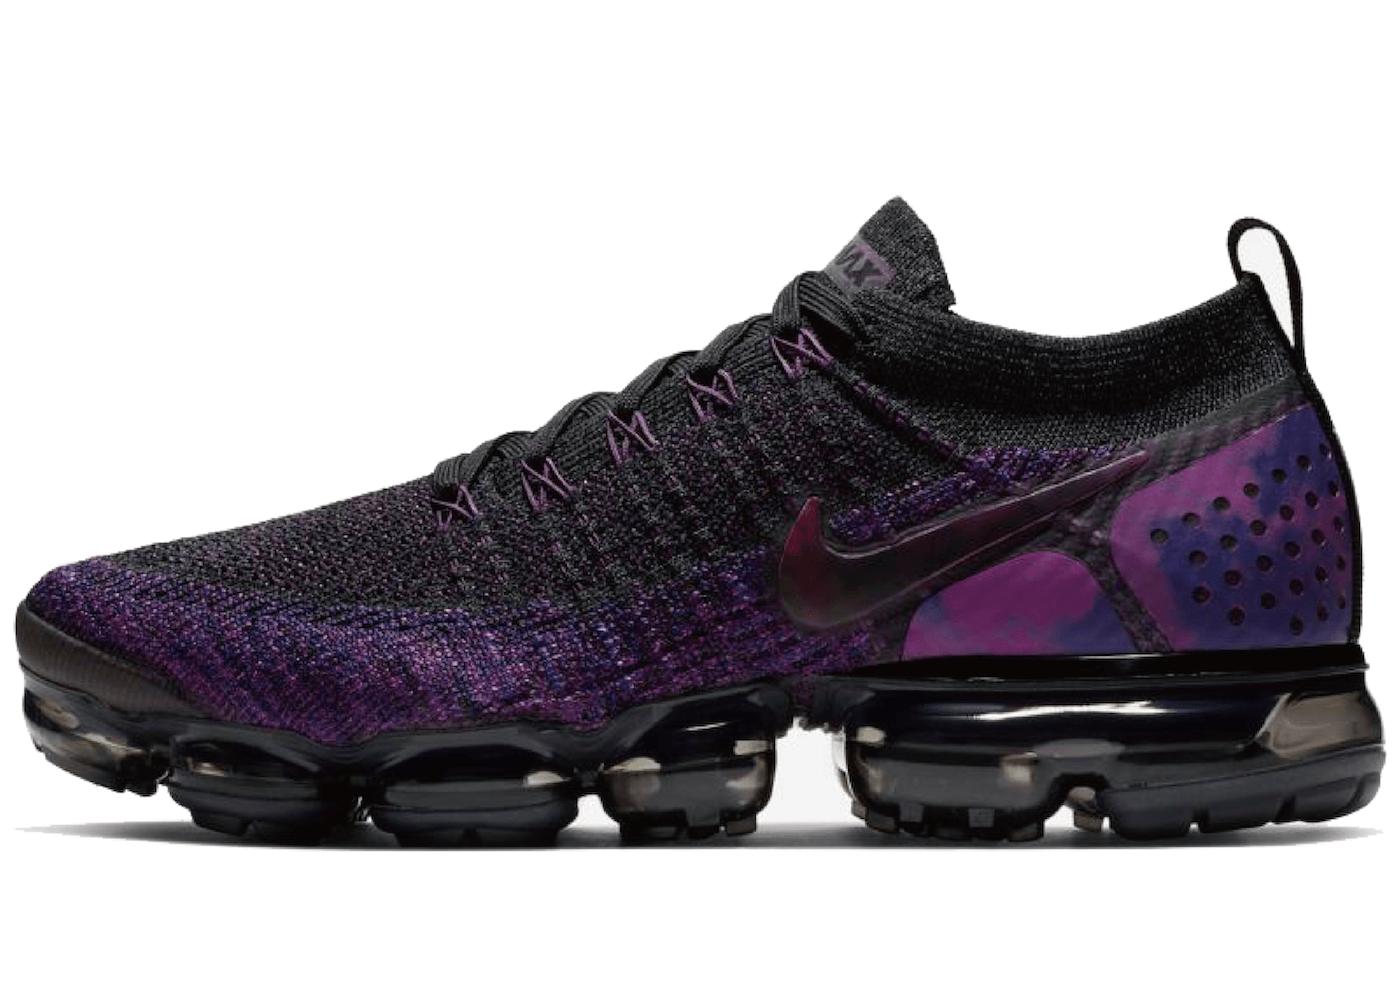 Nike Air Vapormax Flyknit 2 Black Vivid Purple の写真